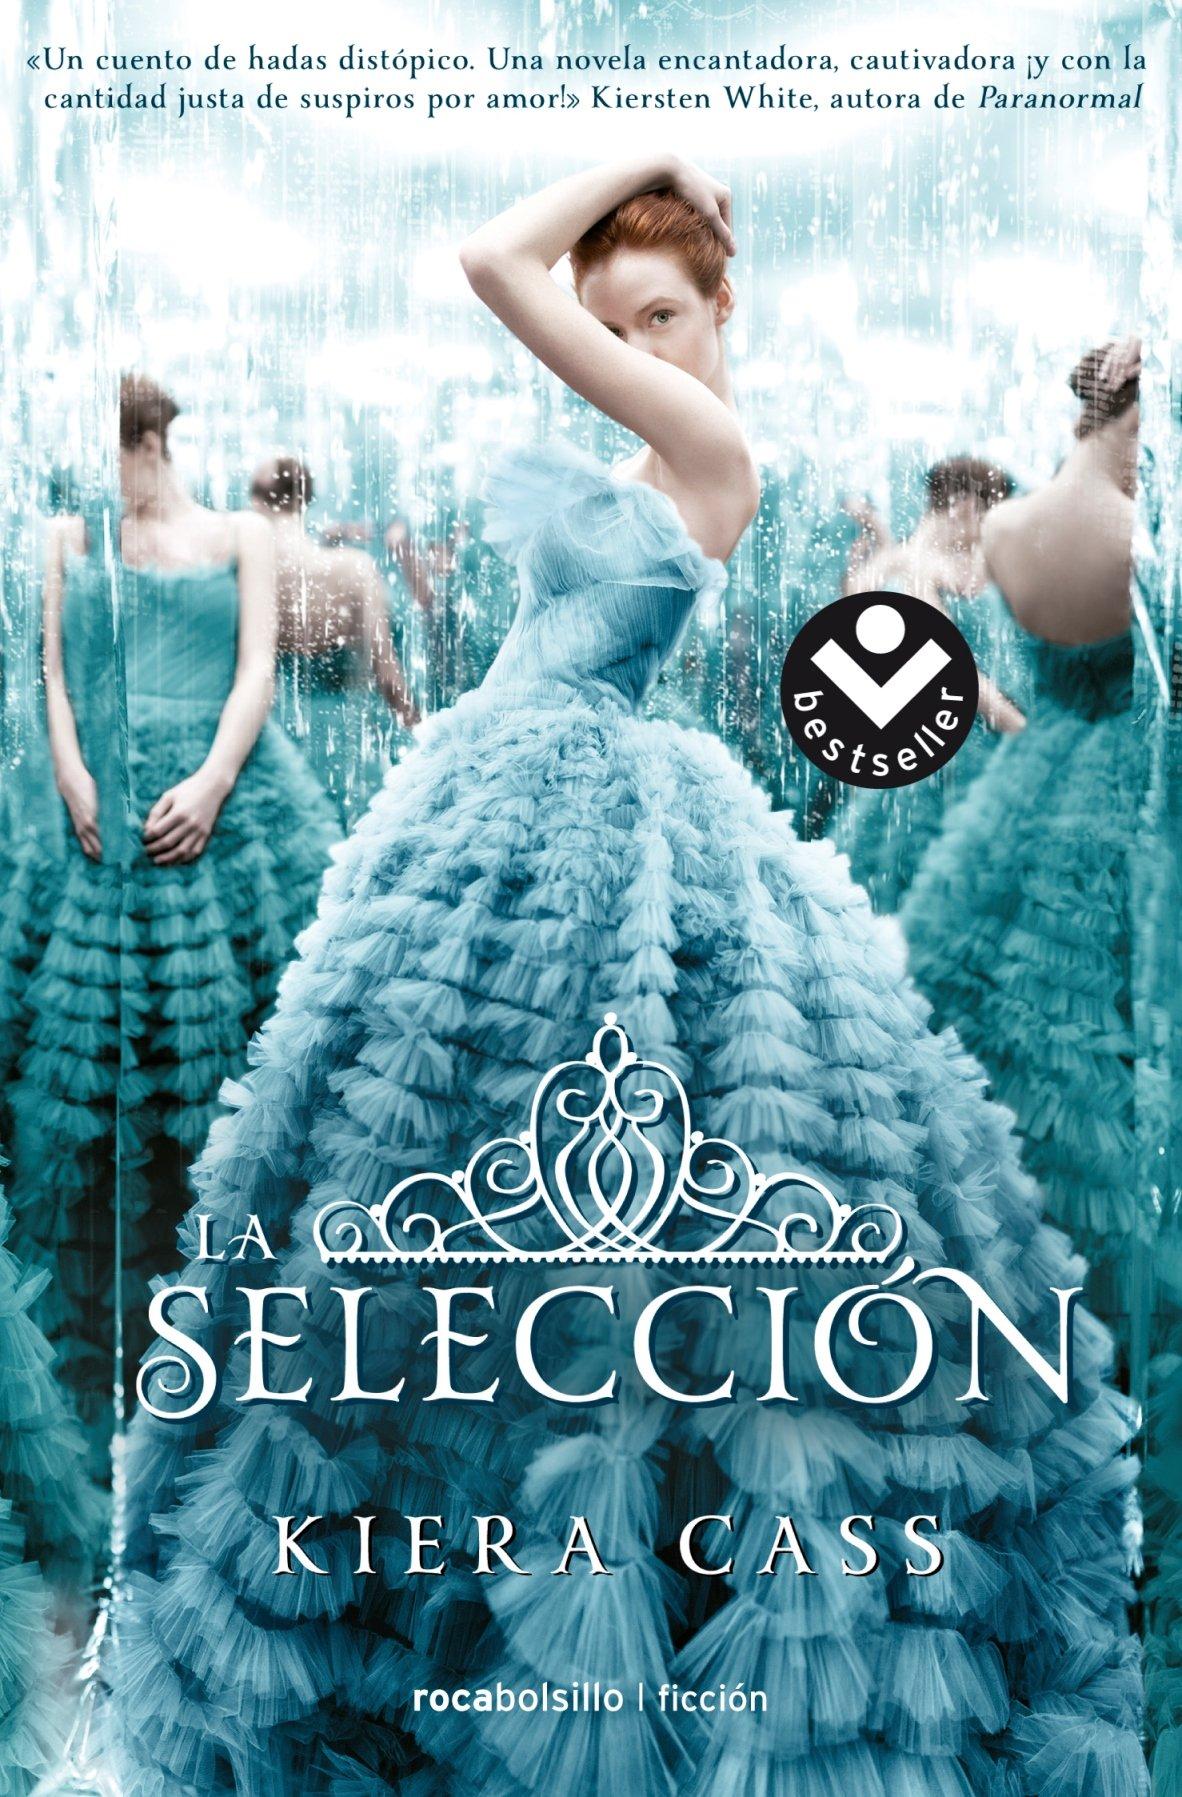 Selecci%C3%B3n Spanish Kiera Cass product image